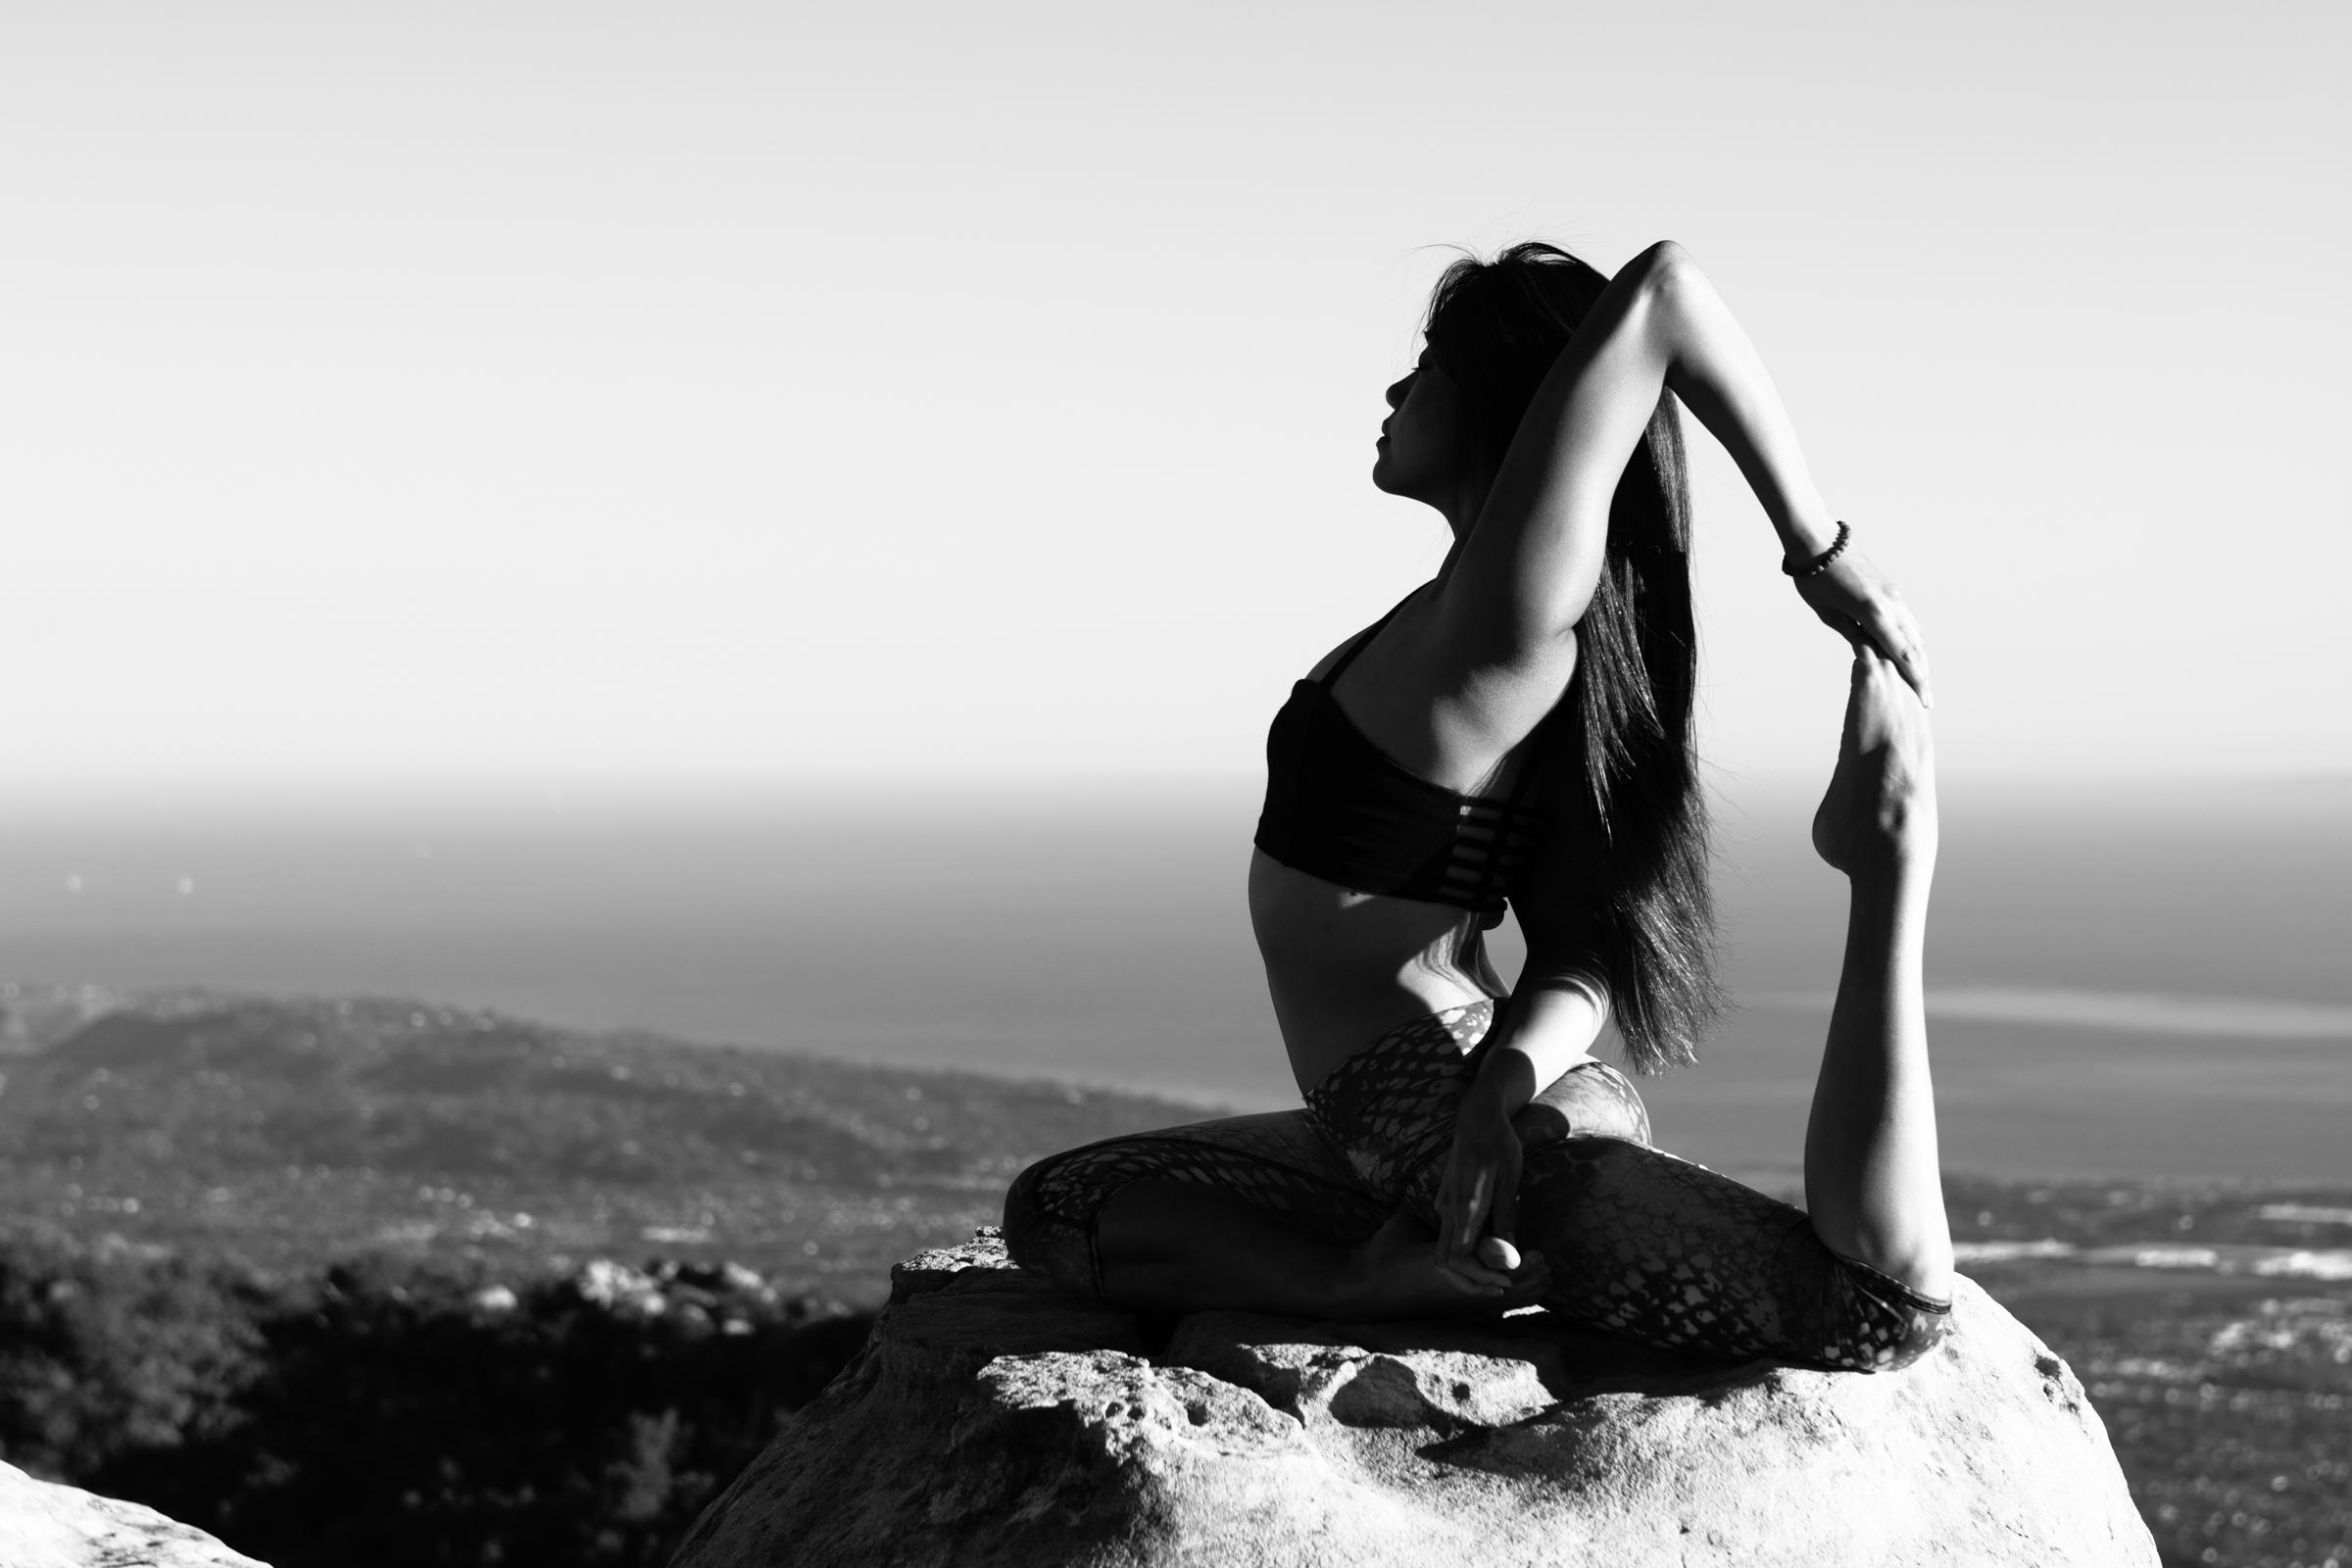 King pigeon asana; Yoga photography Cayman and California